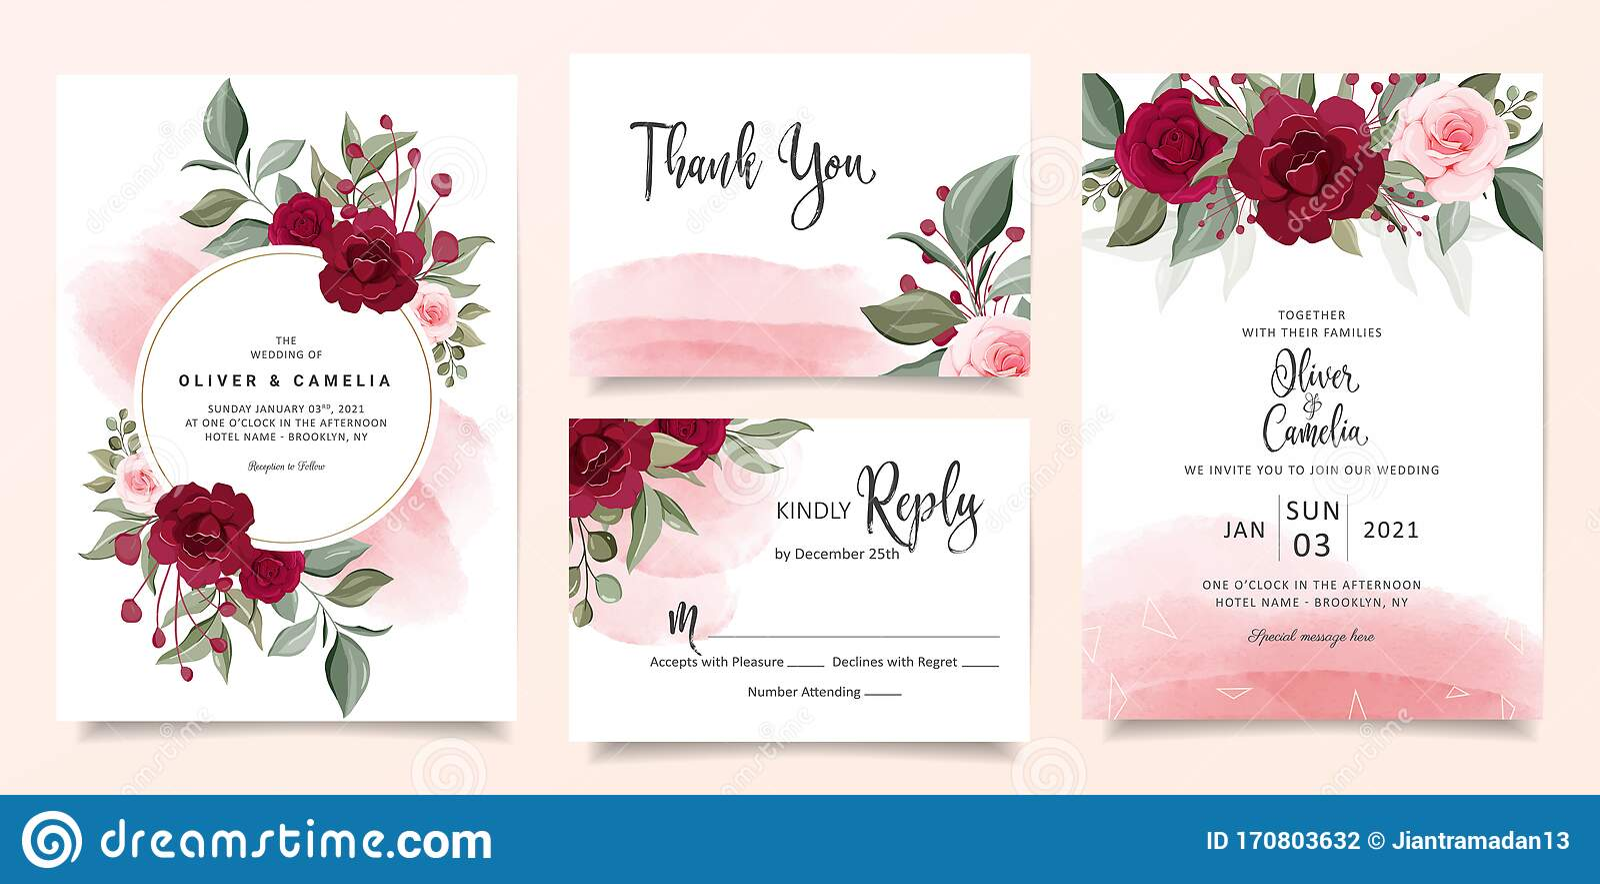 beautiful wedding invitation card template set with